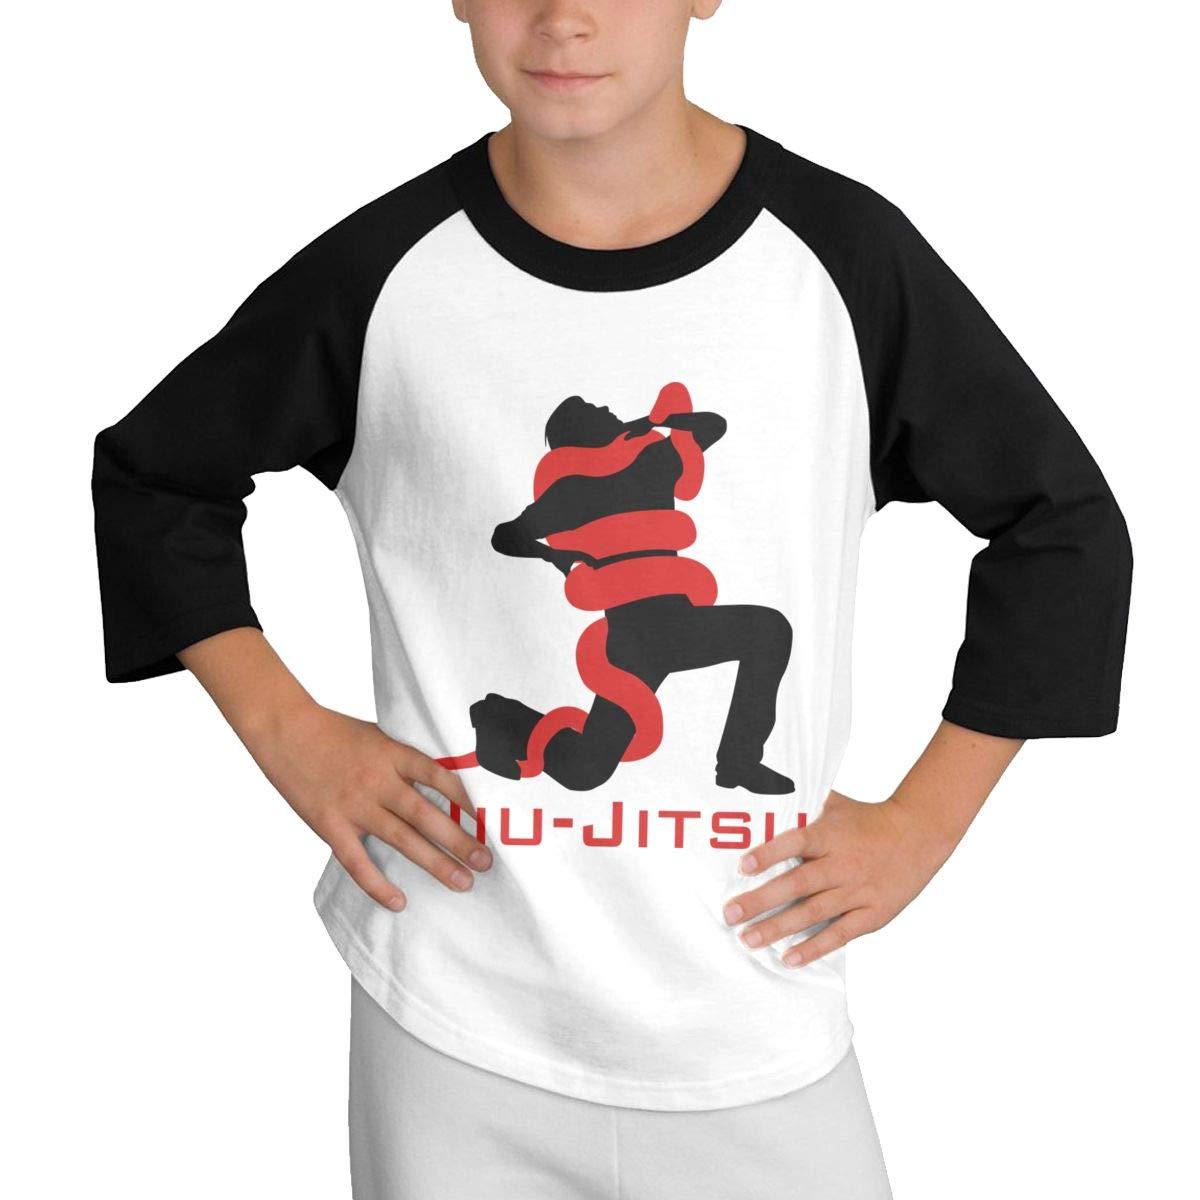 Qiop Nee Jiu-Jitsu Snake Raglan 3//4 Short-Sleeve Shirts Youth Girls Boys